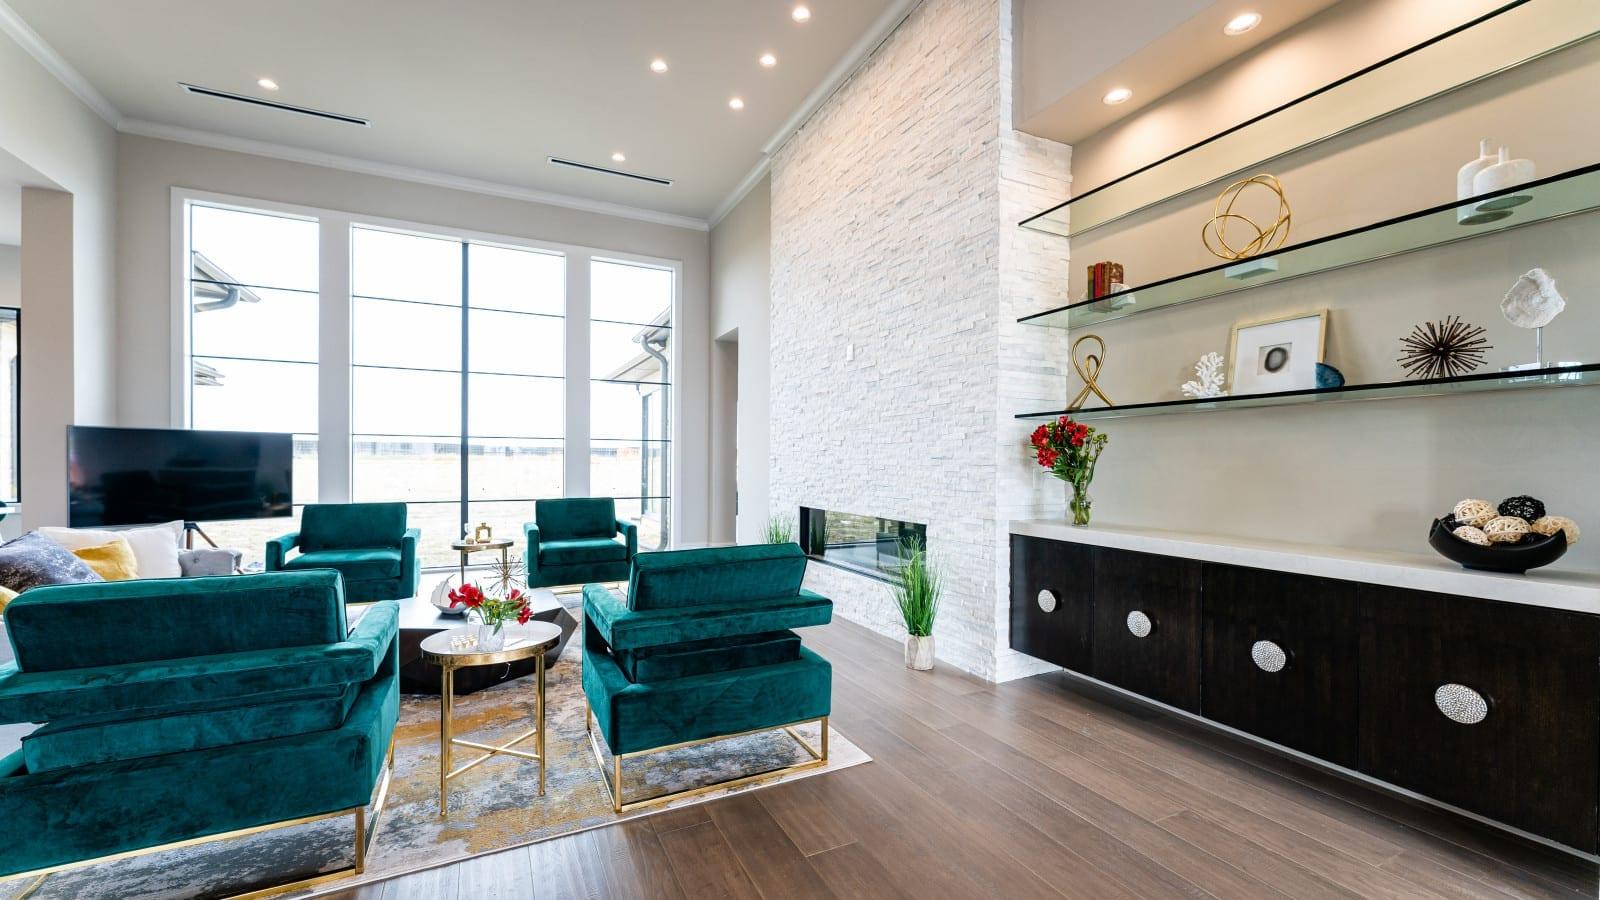 Modern Style Homes design # 39 - Millennial Design + Build